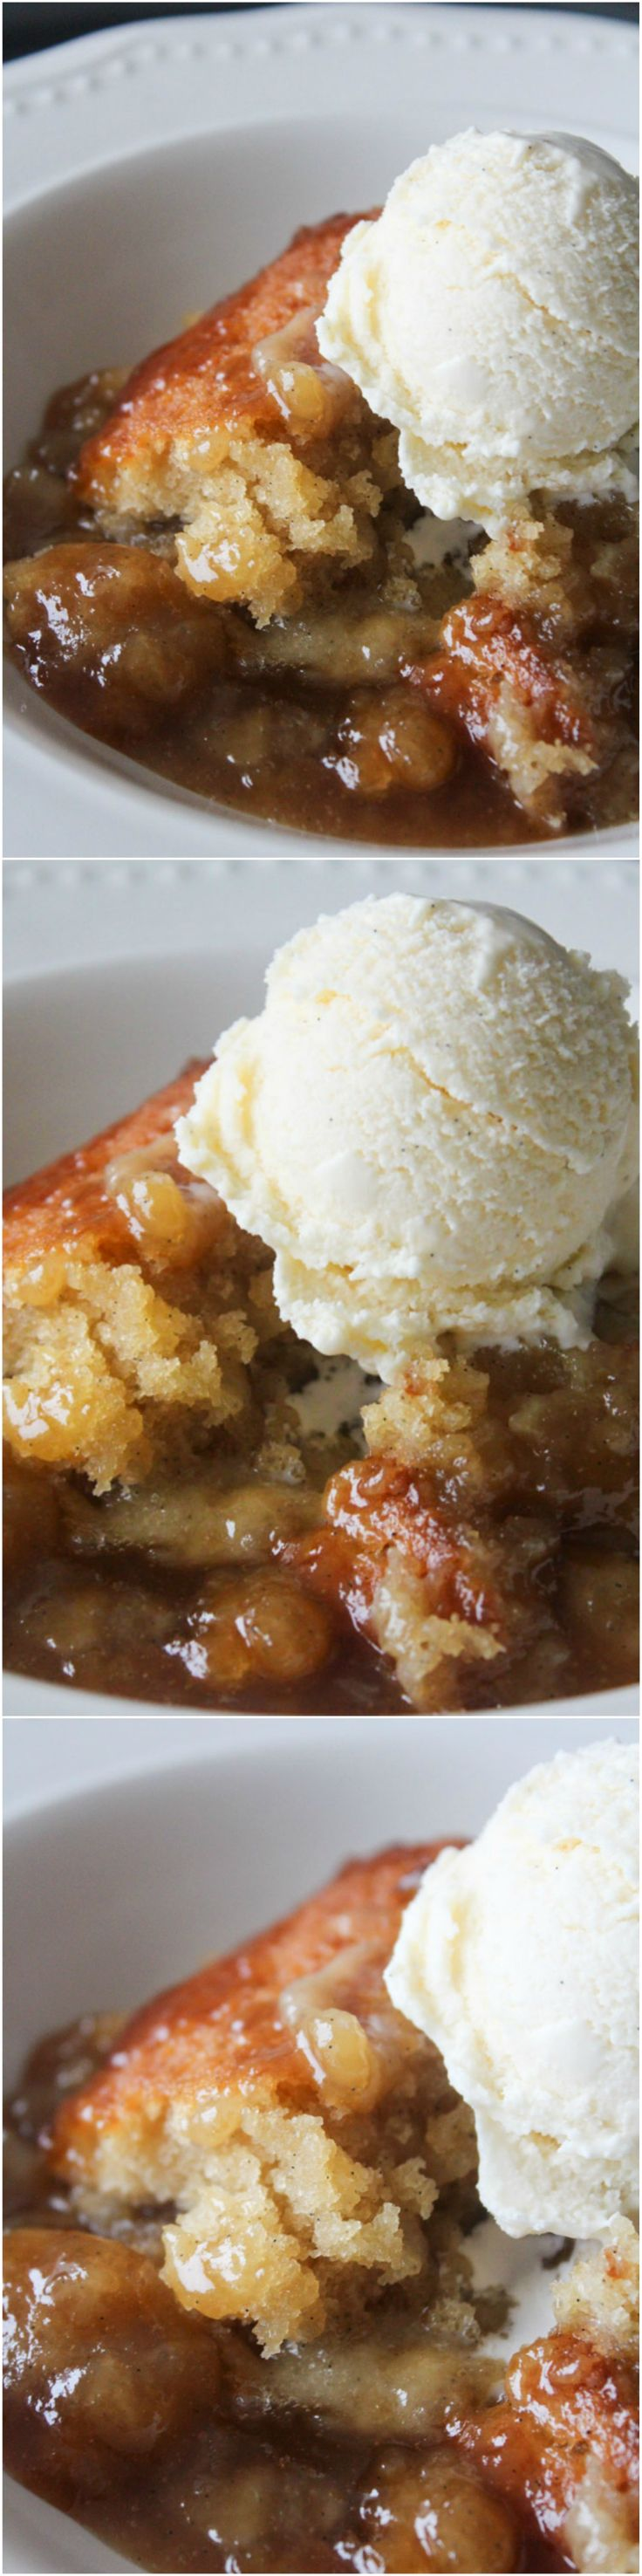 Hot Fudge Vanilla Pudding Cake